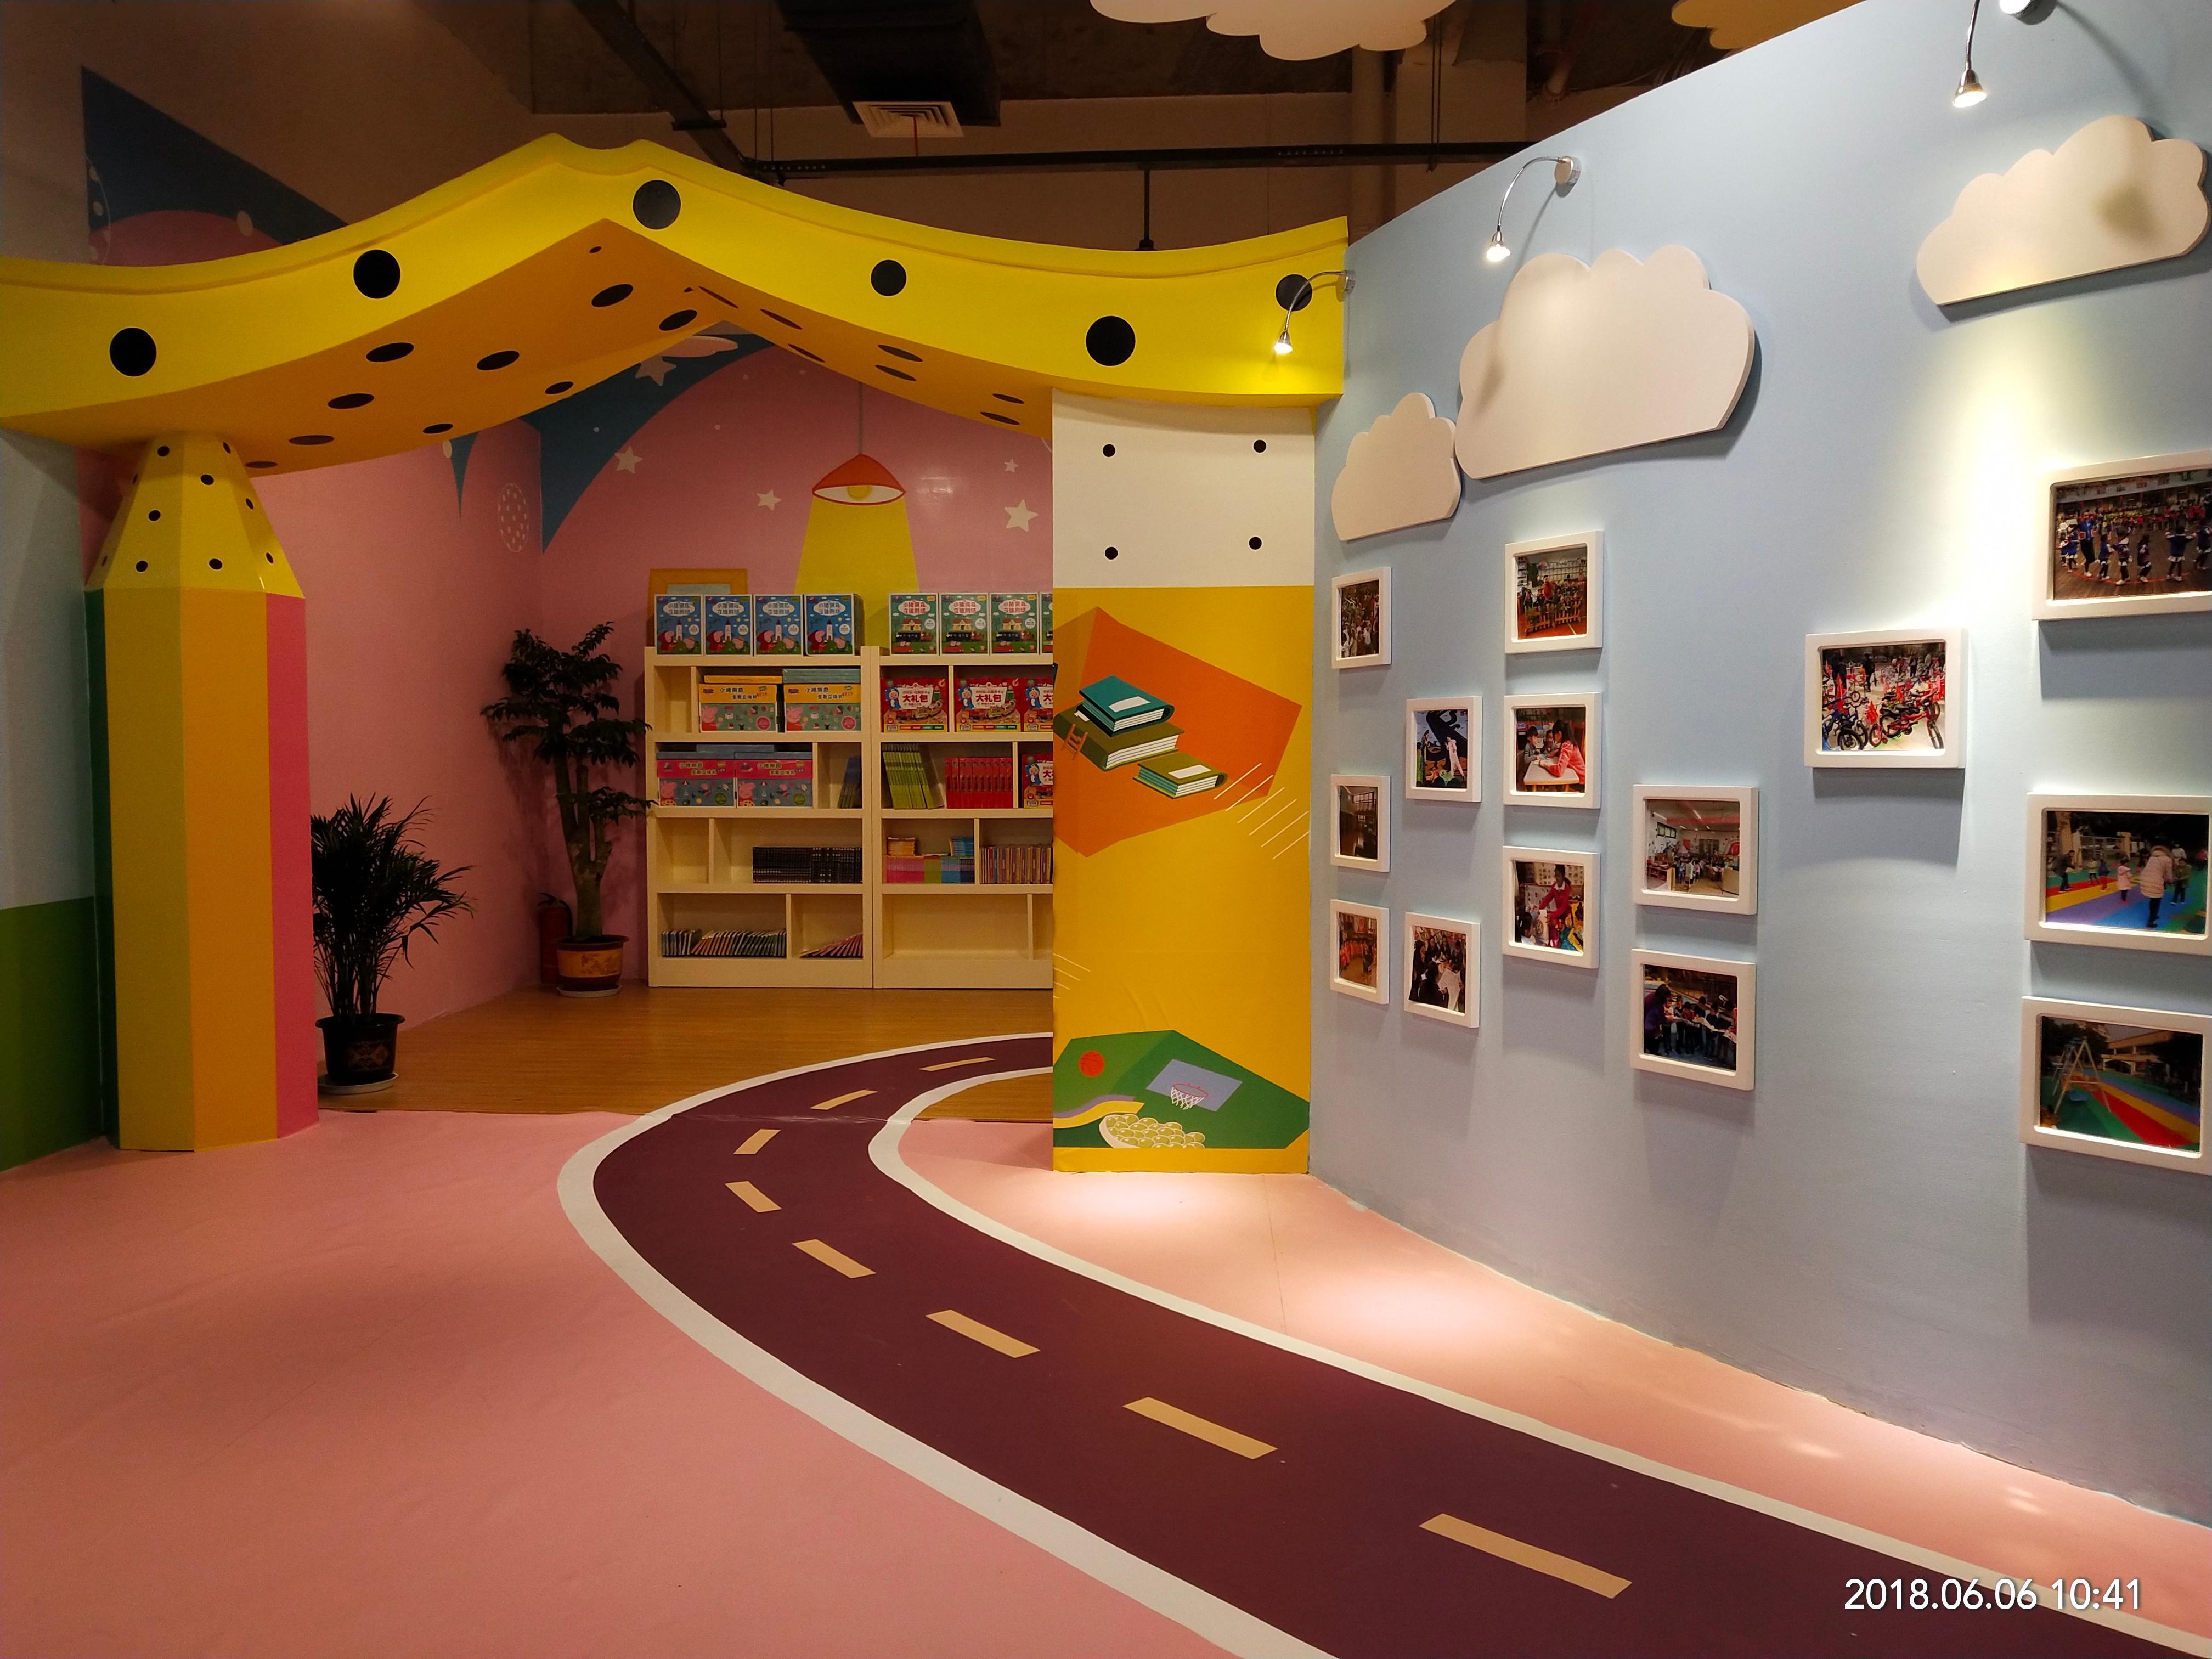 topshow-inspace好好玩童书馆(四川绵阳城市奥莱站)图片